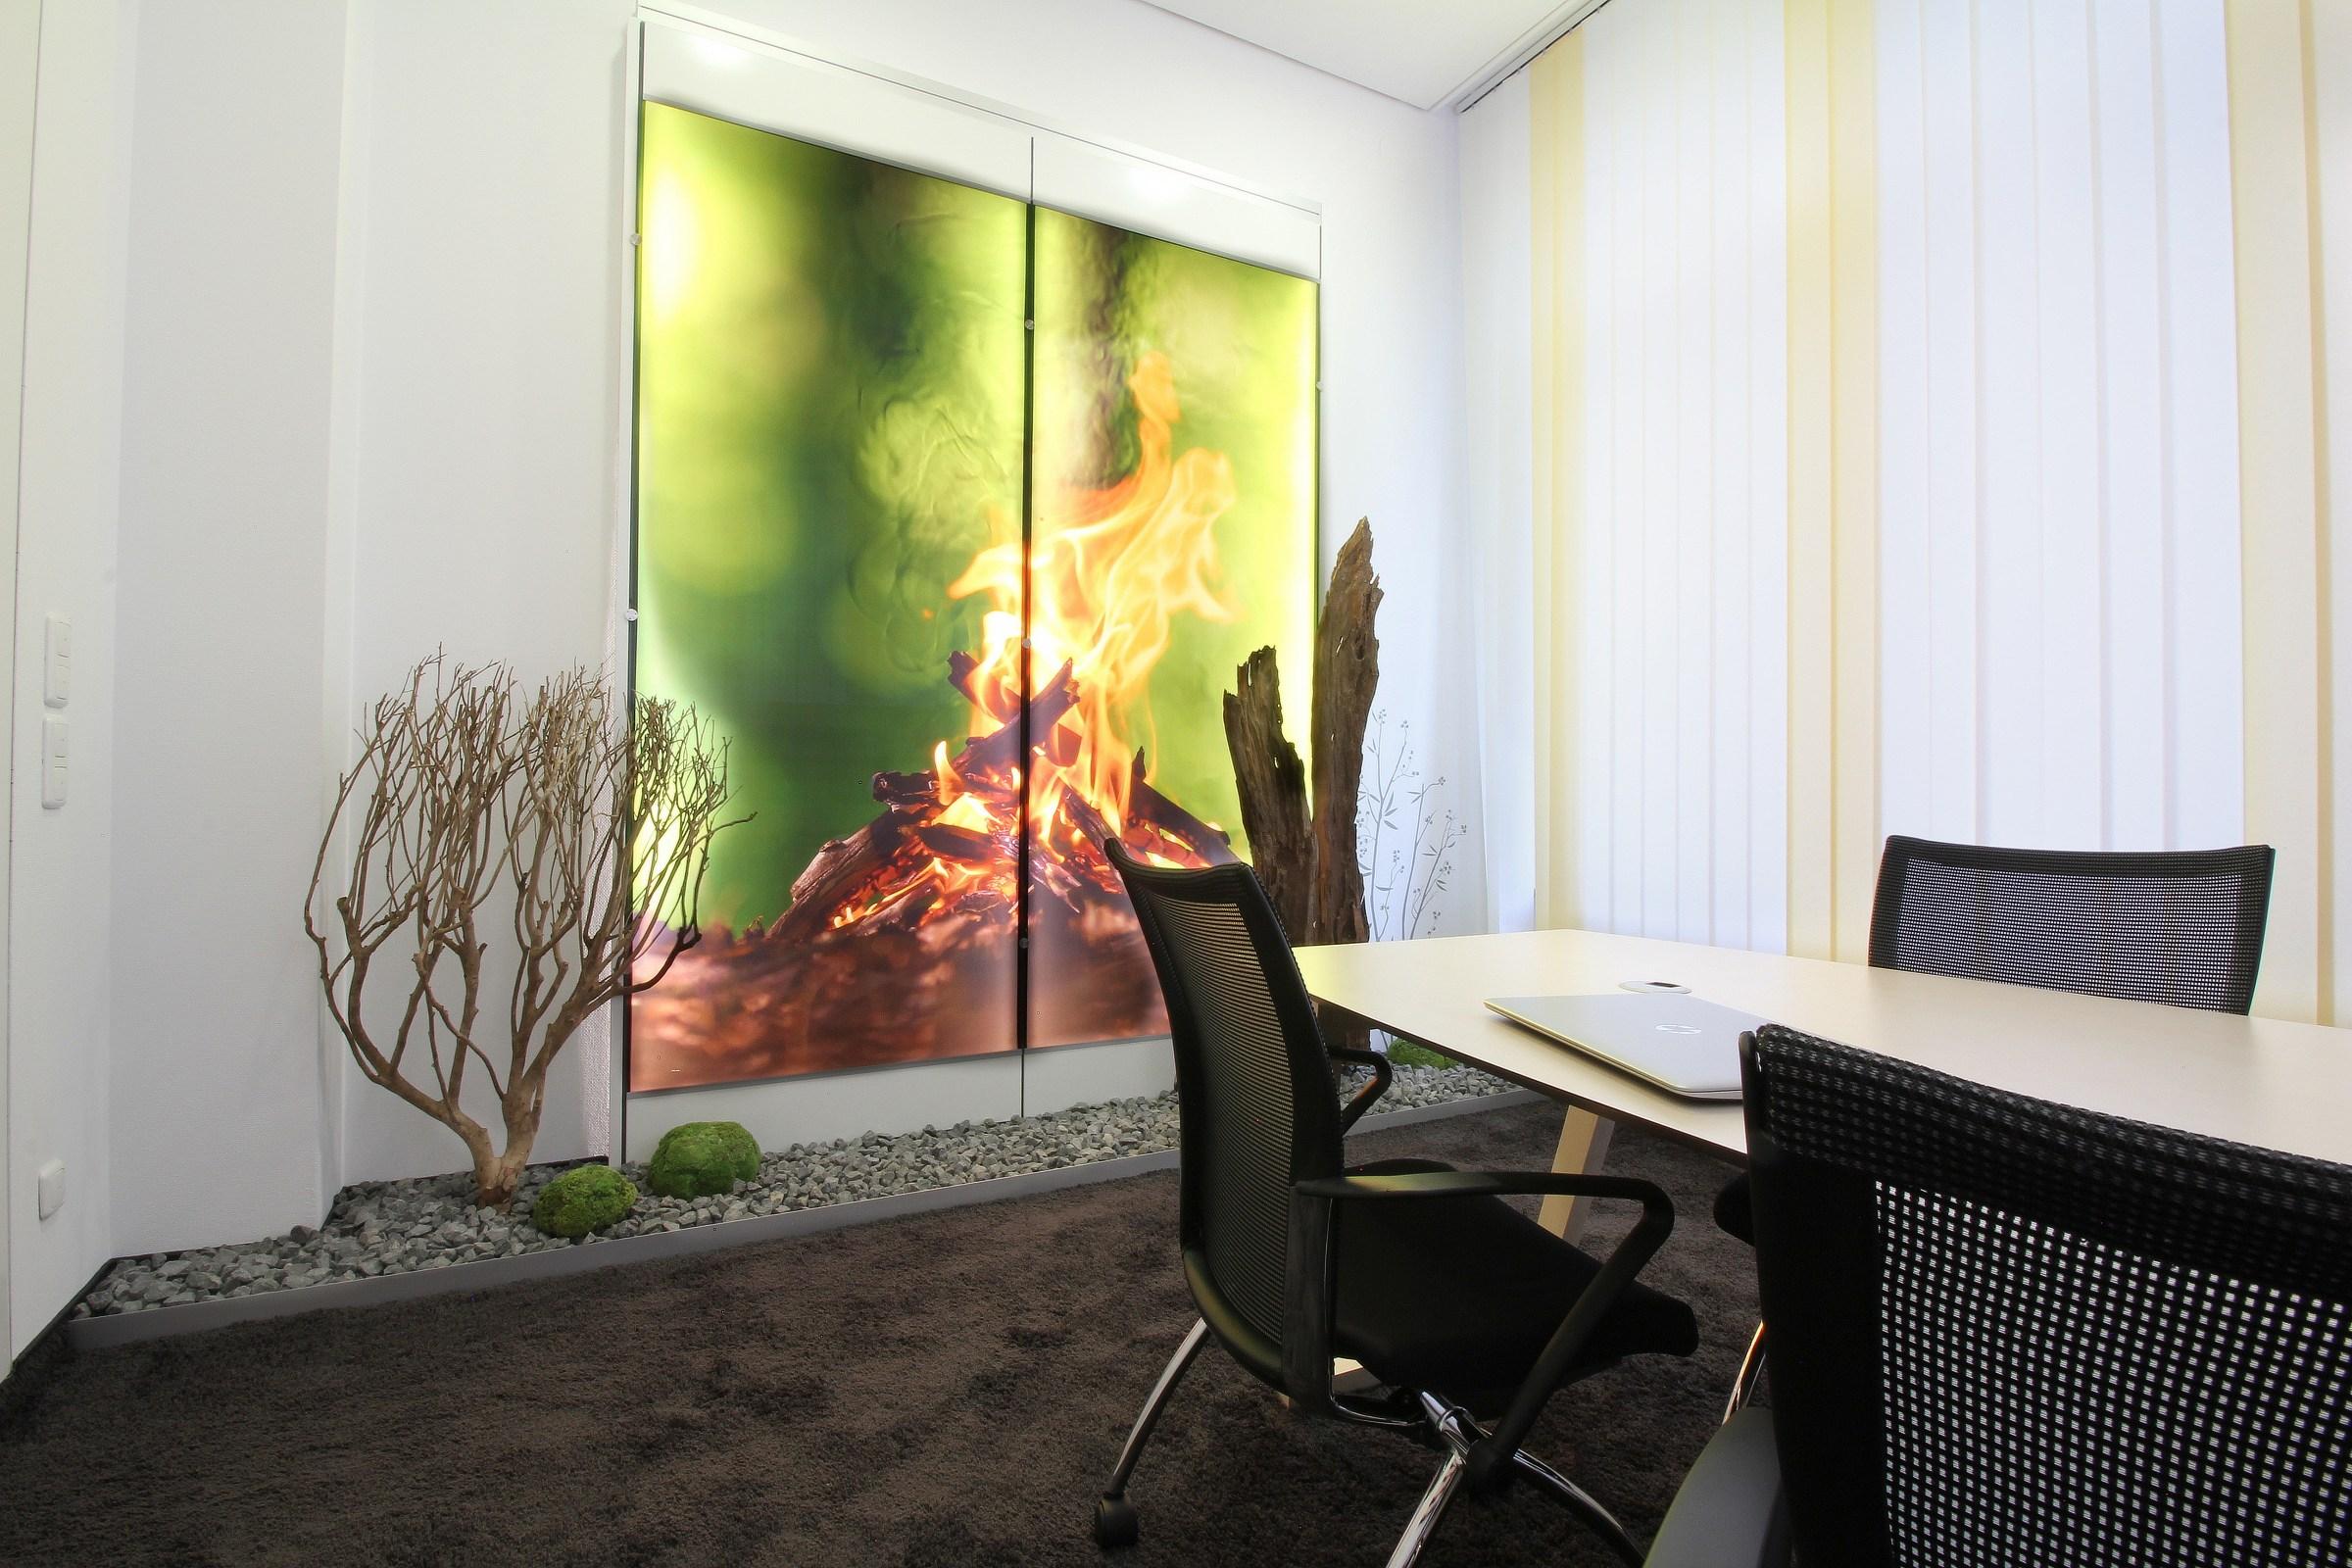 Bad Wörishofen - Beratungsbüro Feuer